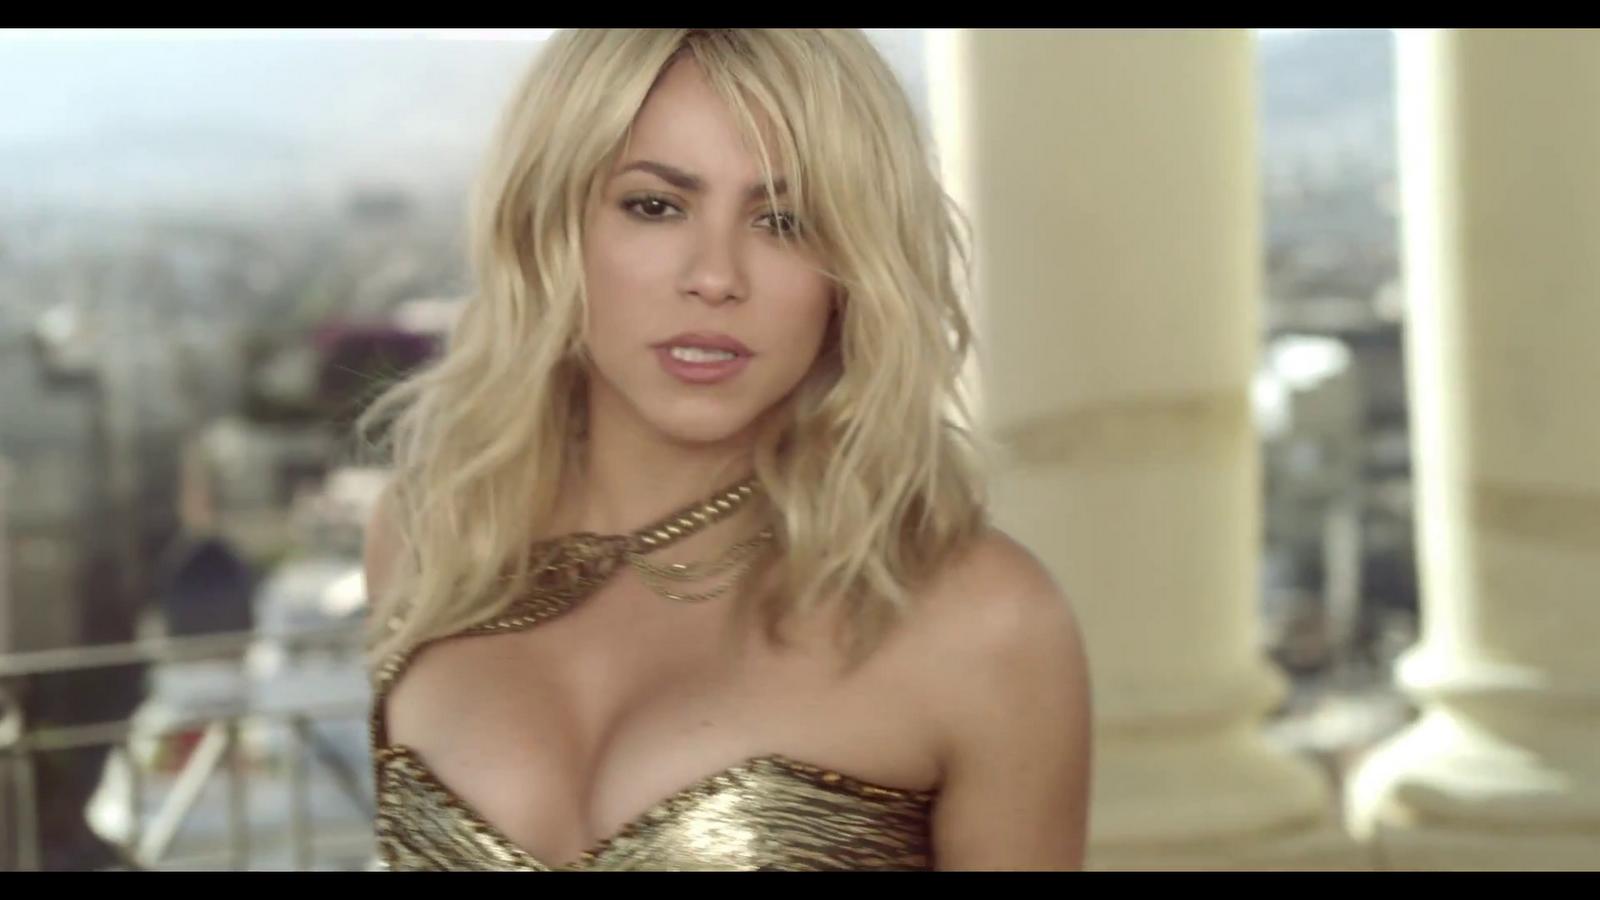 http://4.bp.blogspot.com/-UeNu337K4YU/UBqdVeDBwOI/AAAAAAAAKLA/exW1_xFMRBA/s1600/Pitbull+-+Get+It+Started+ft.+Shakira.MP4+%25281%2529.png